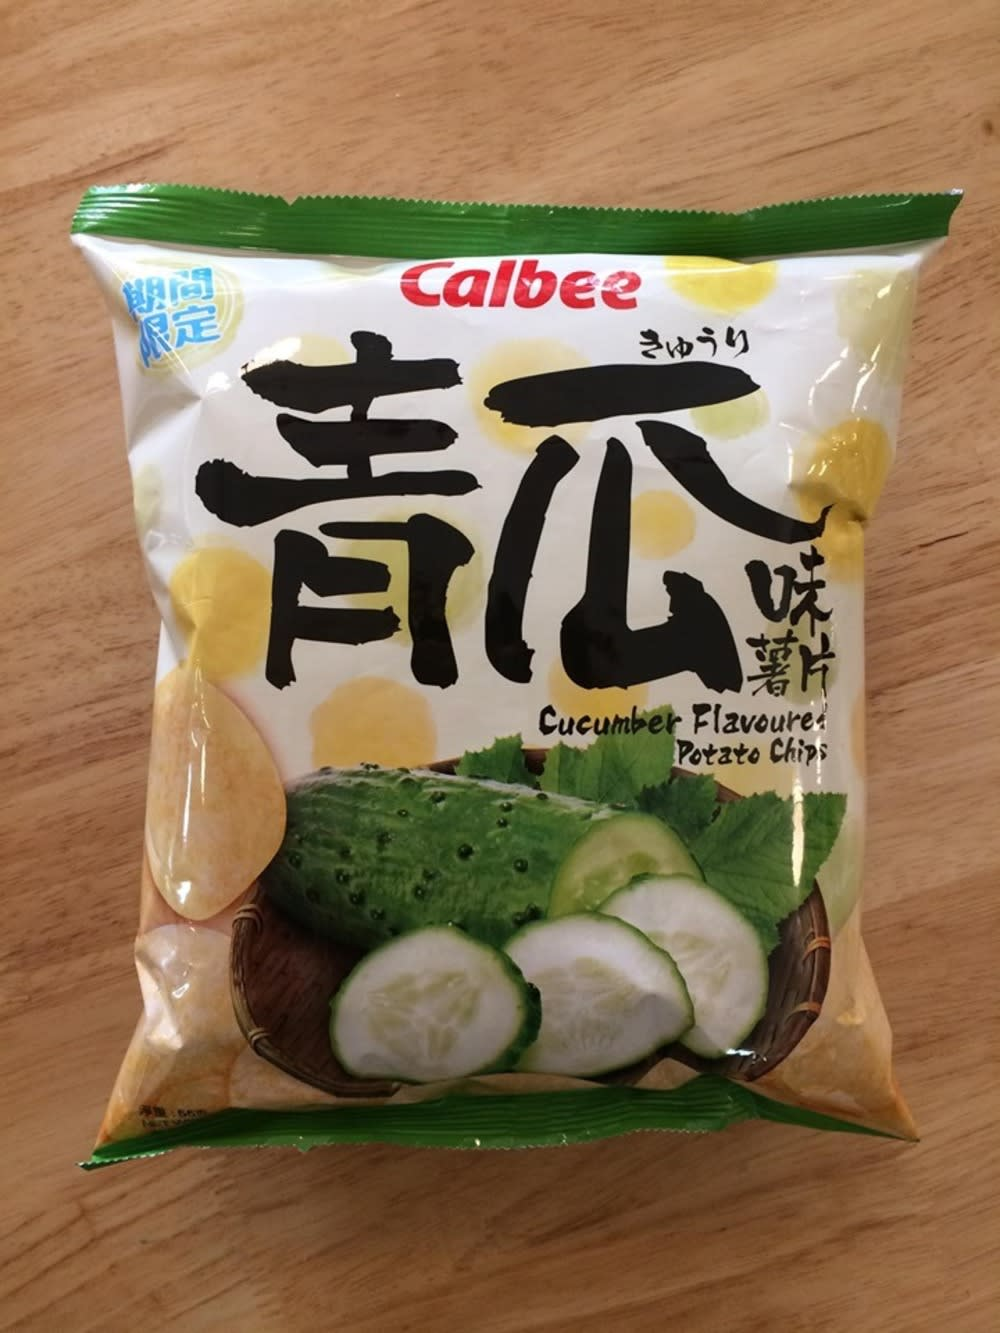 Calbee Cucumber crisps